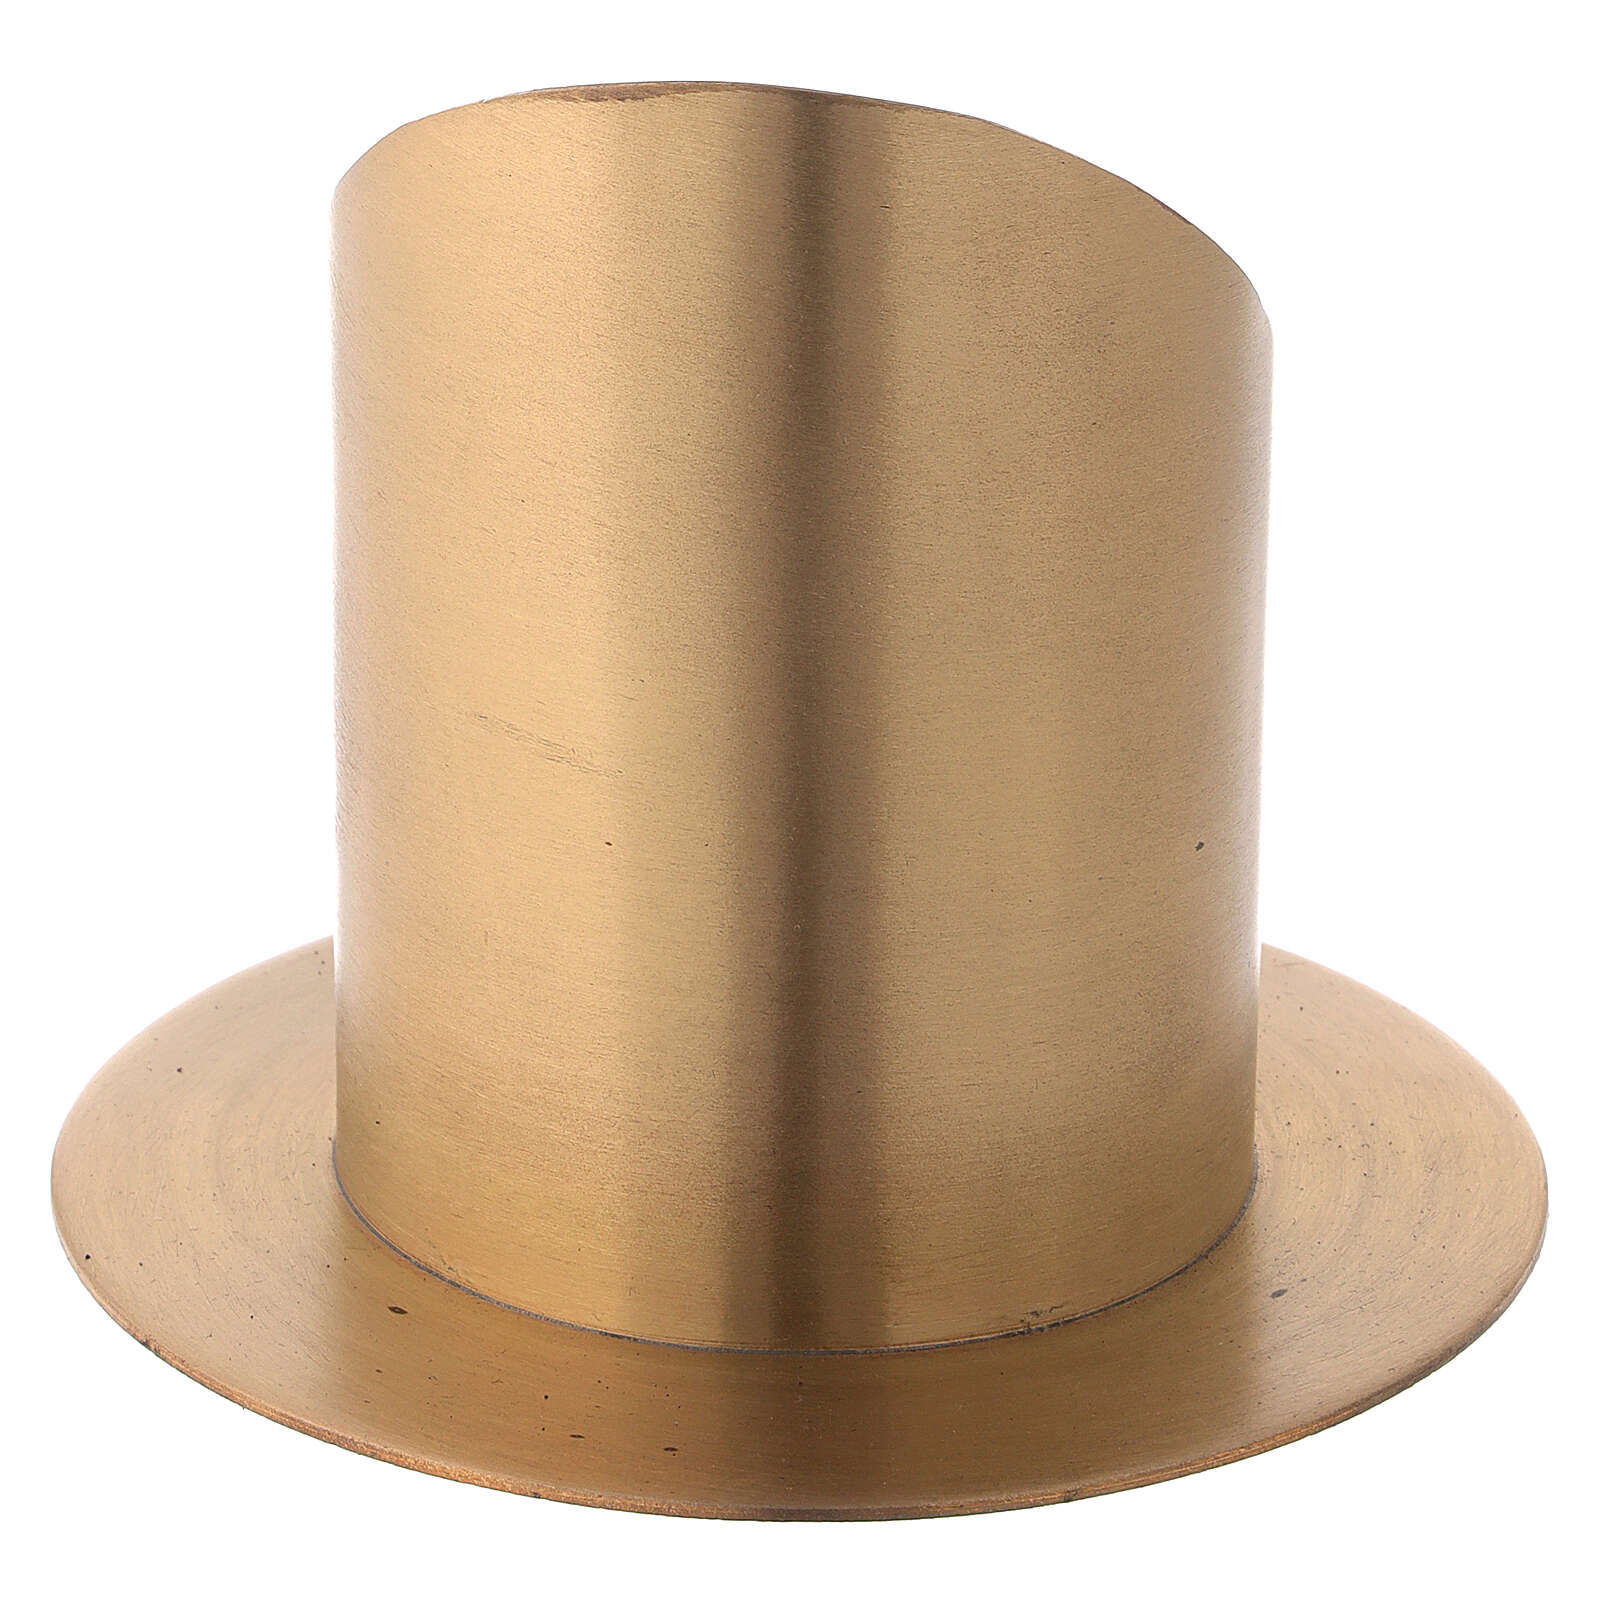 Portacandela aperto ottone nichelato satinato diametro 8 cm 4